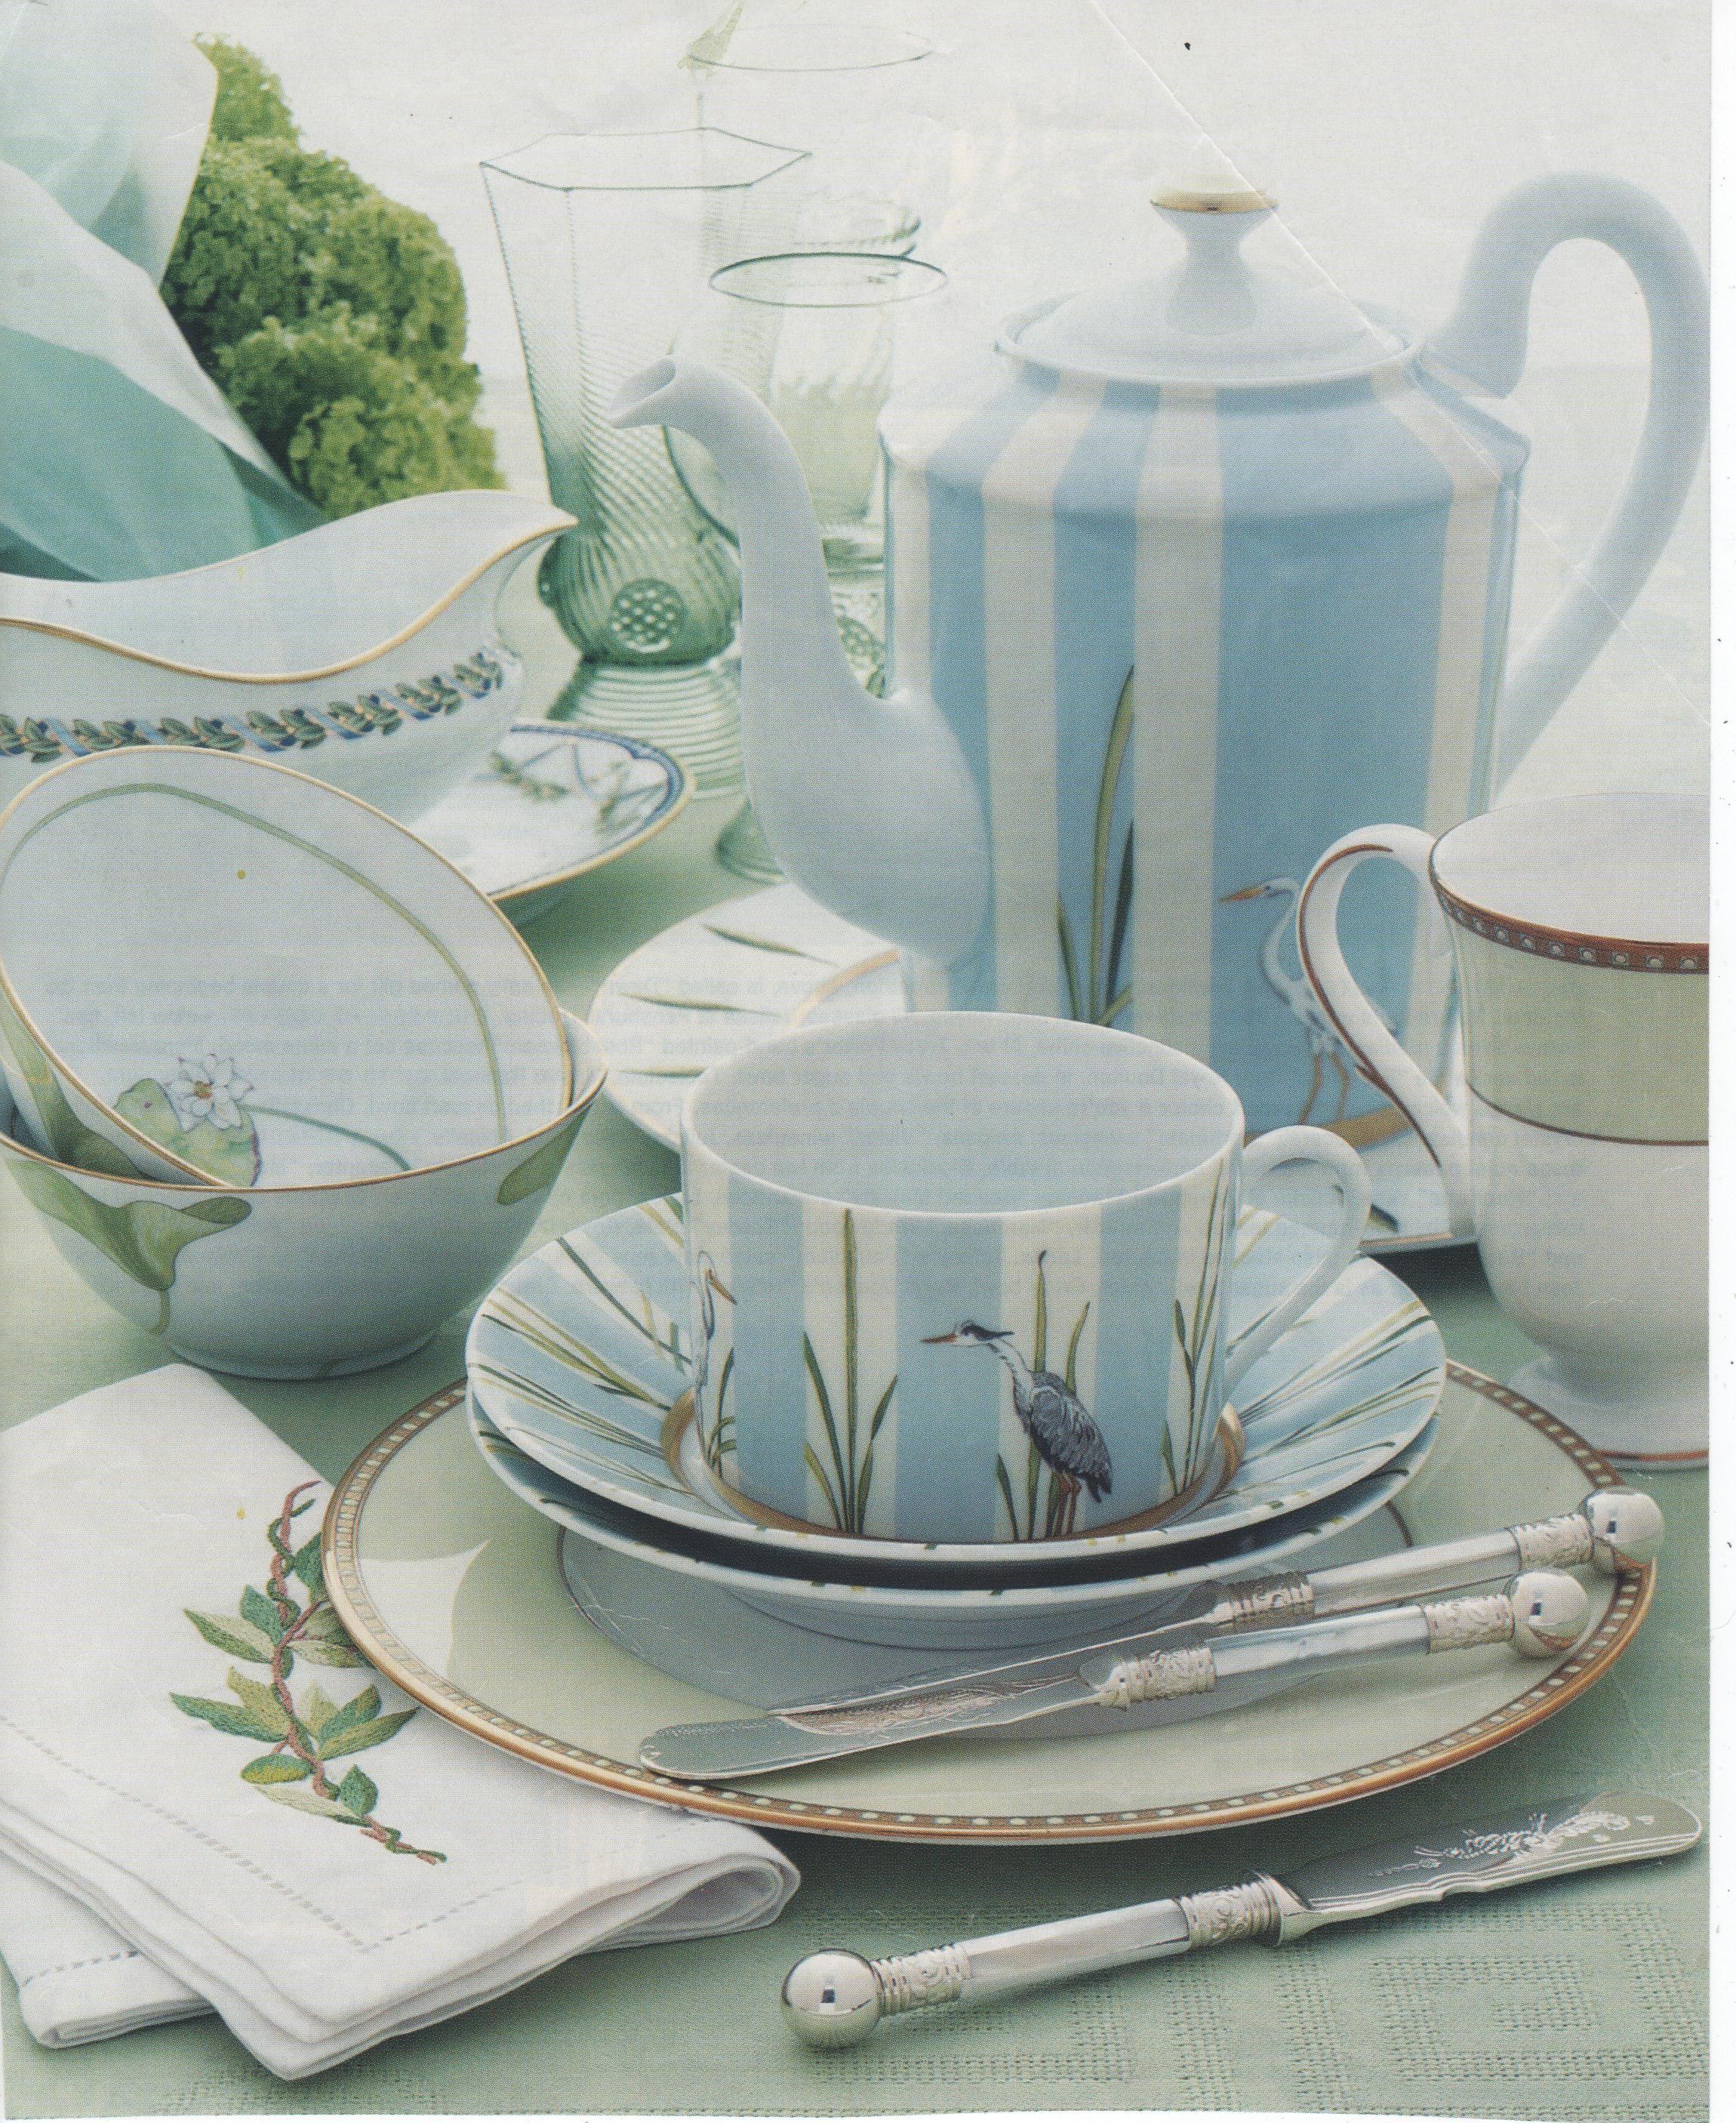 Glassware Juliska, Hermes heron china cups also Nil bowls.